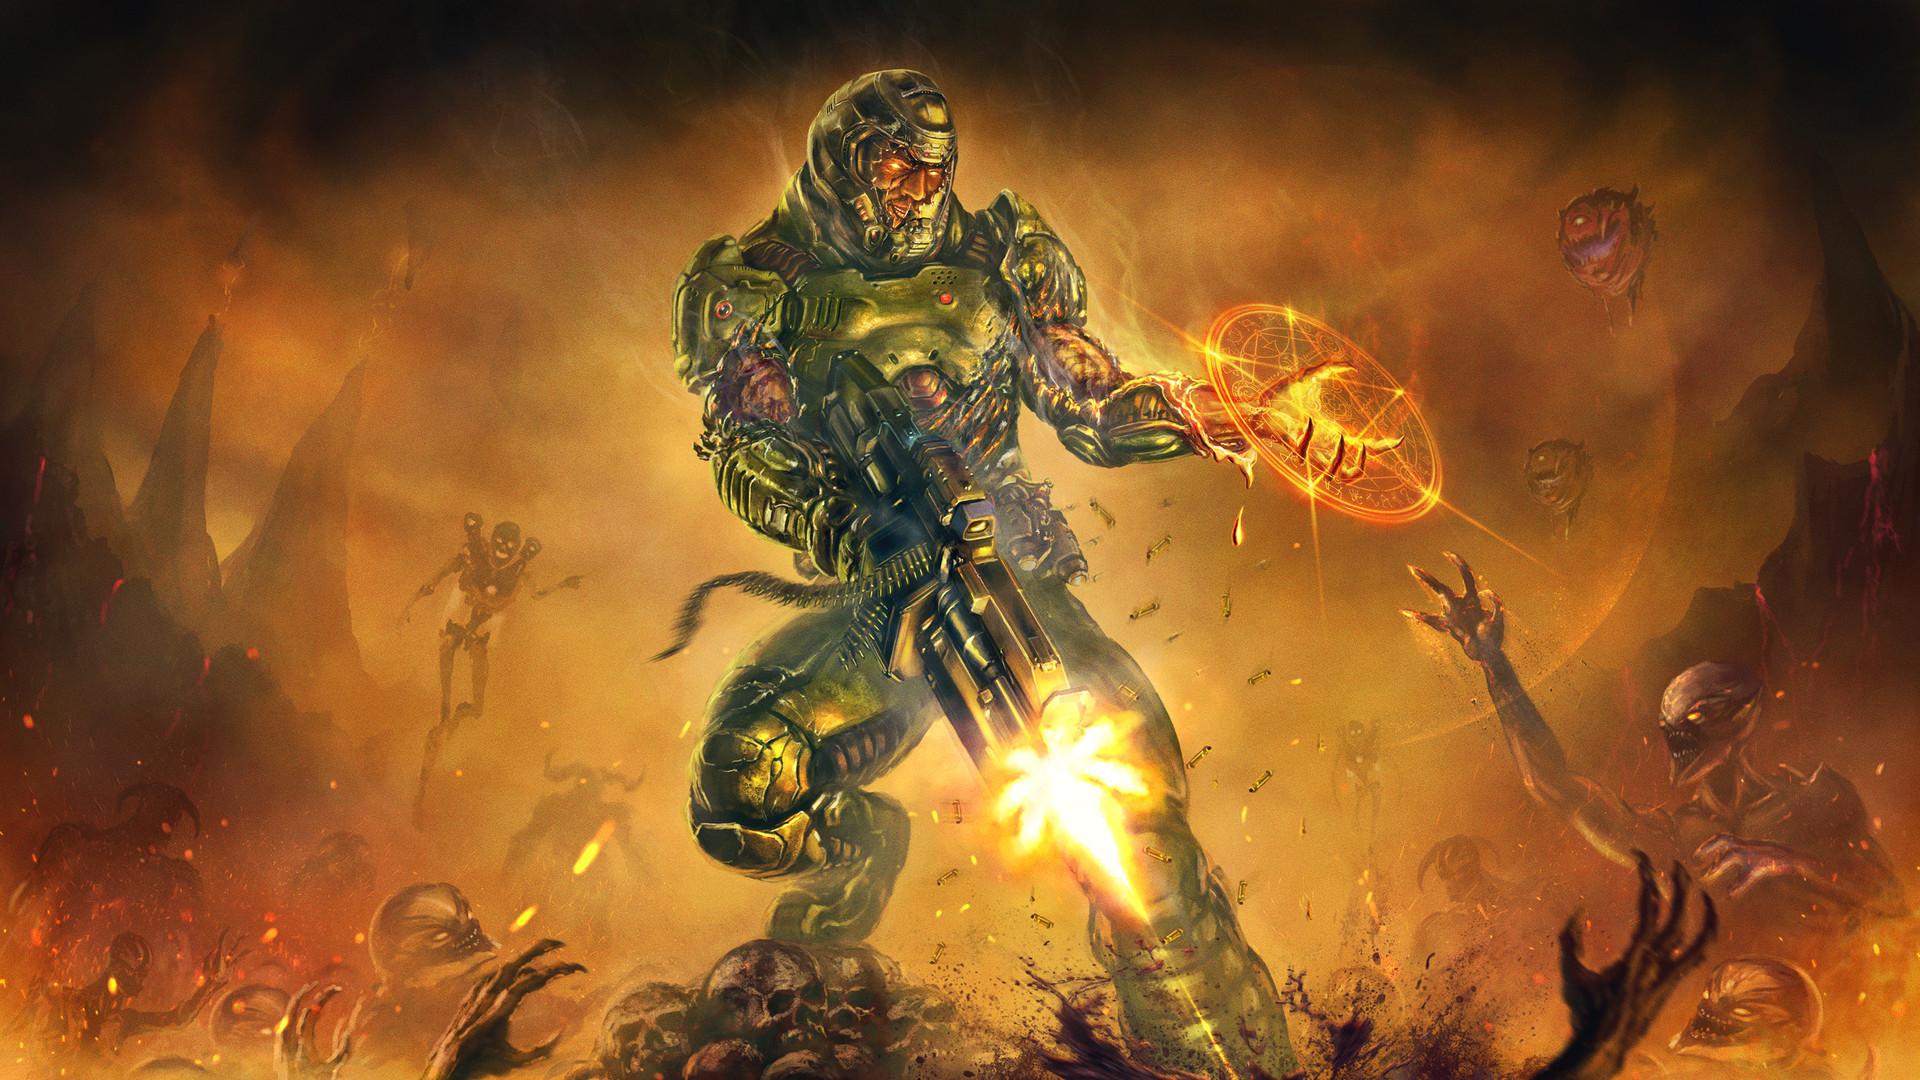 doom (2016) hd wallpaper | background image | 1920x1080 | id:701274